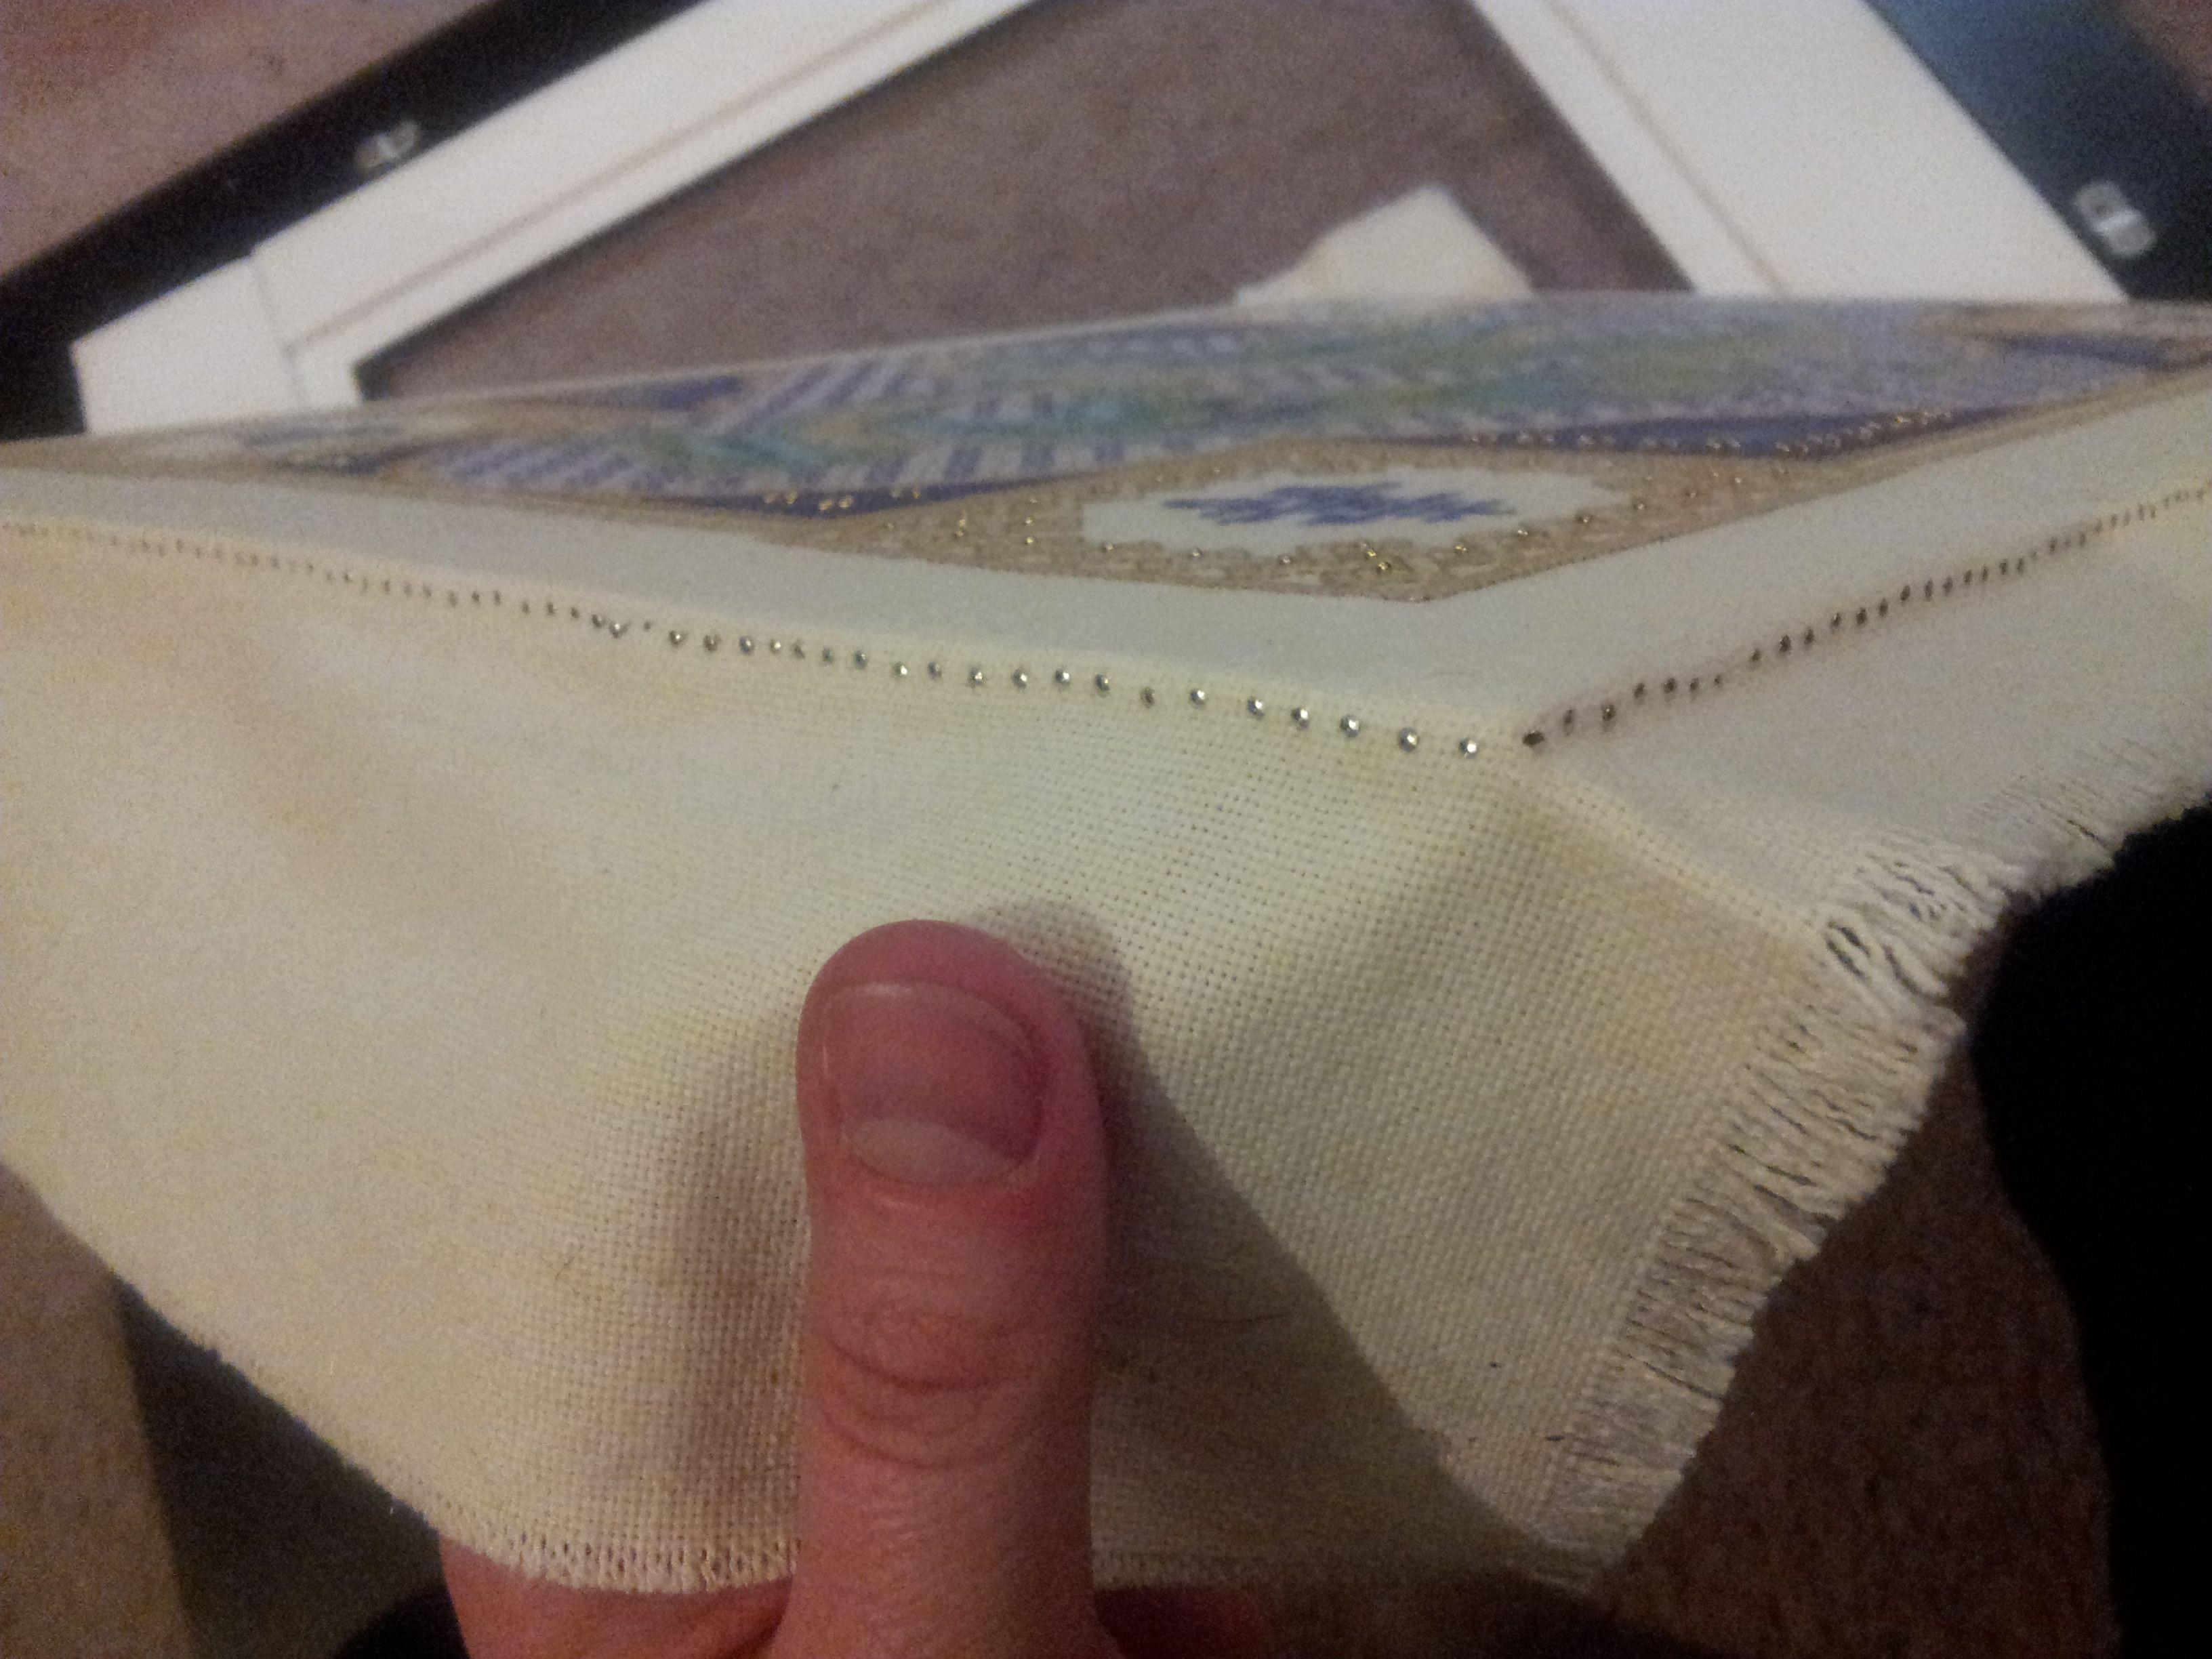 cross-stitch framing tutorial | Cross stitch, Stitch and Tutorials